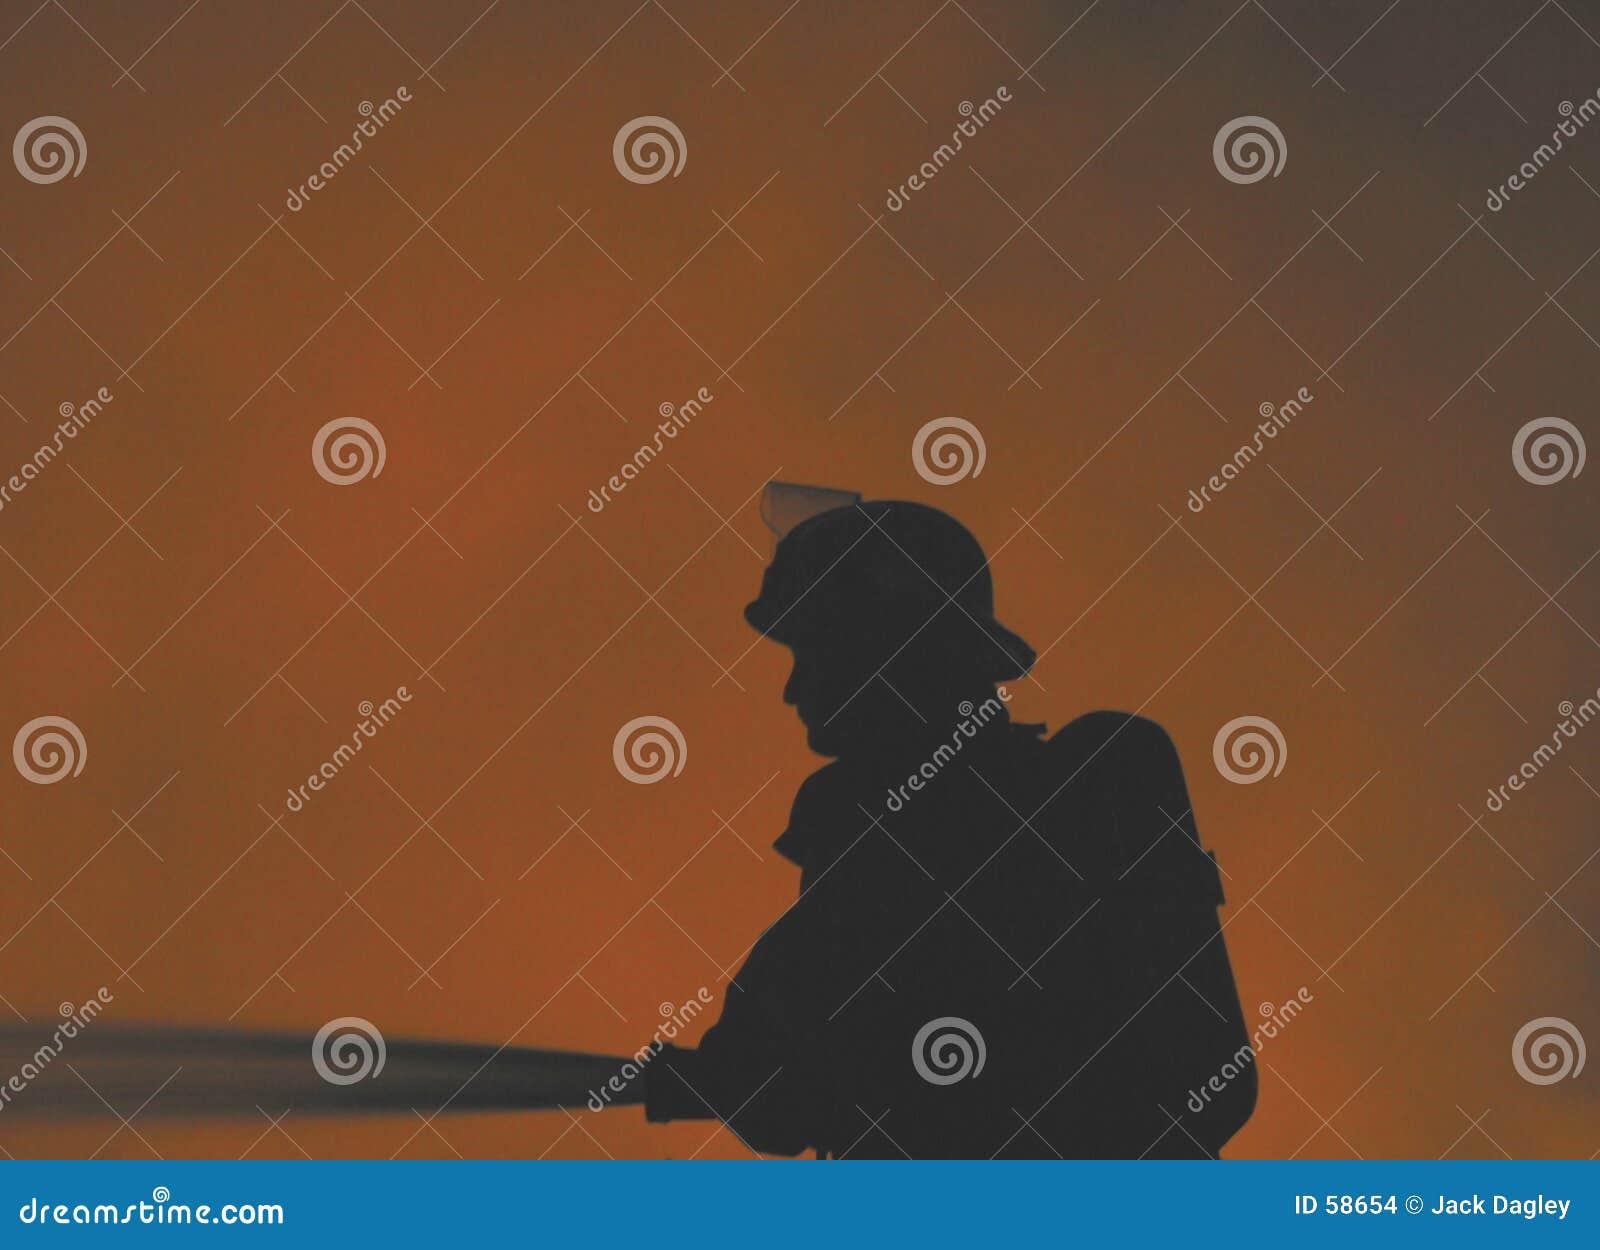 Bombero solitario